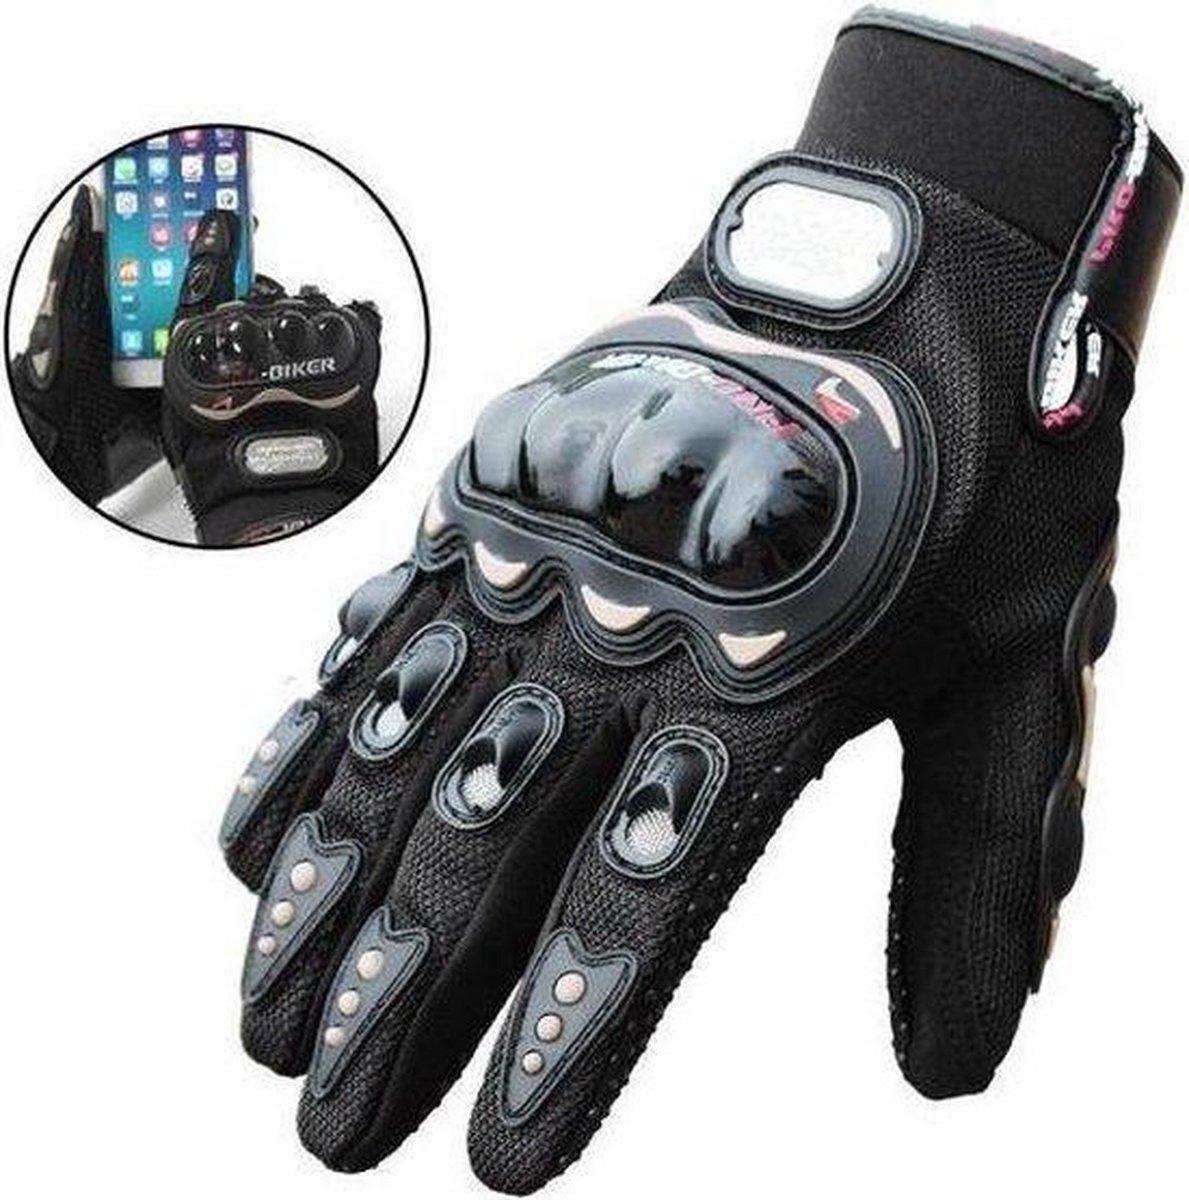 Motorhandschoenen - Zwart - Handschoenen Motor & Scooter - Maat XXL - Touchscreen - Bescherming